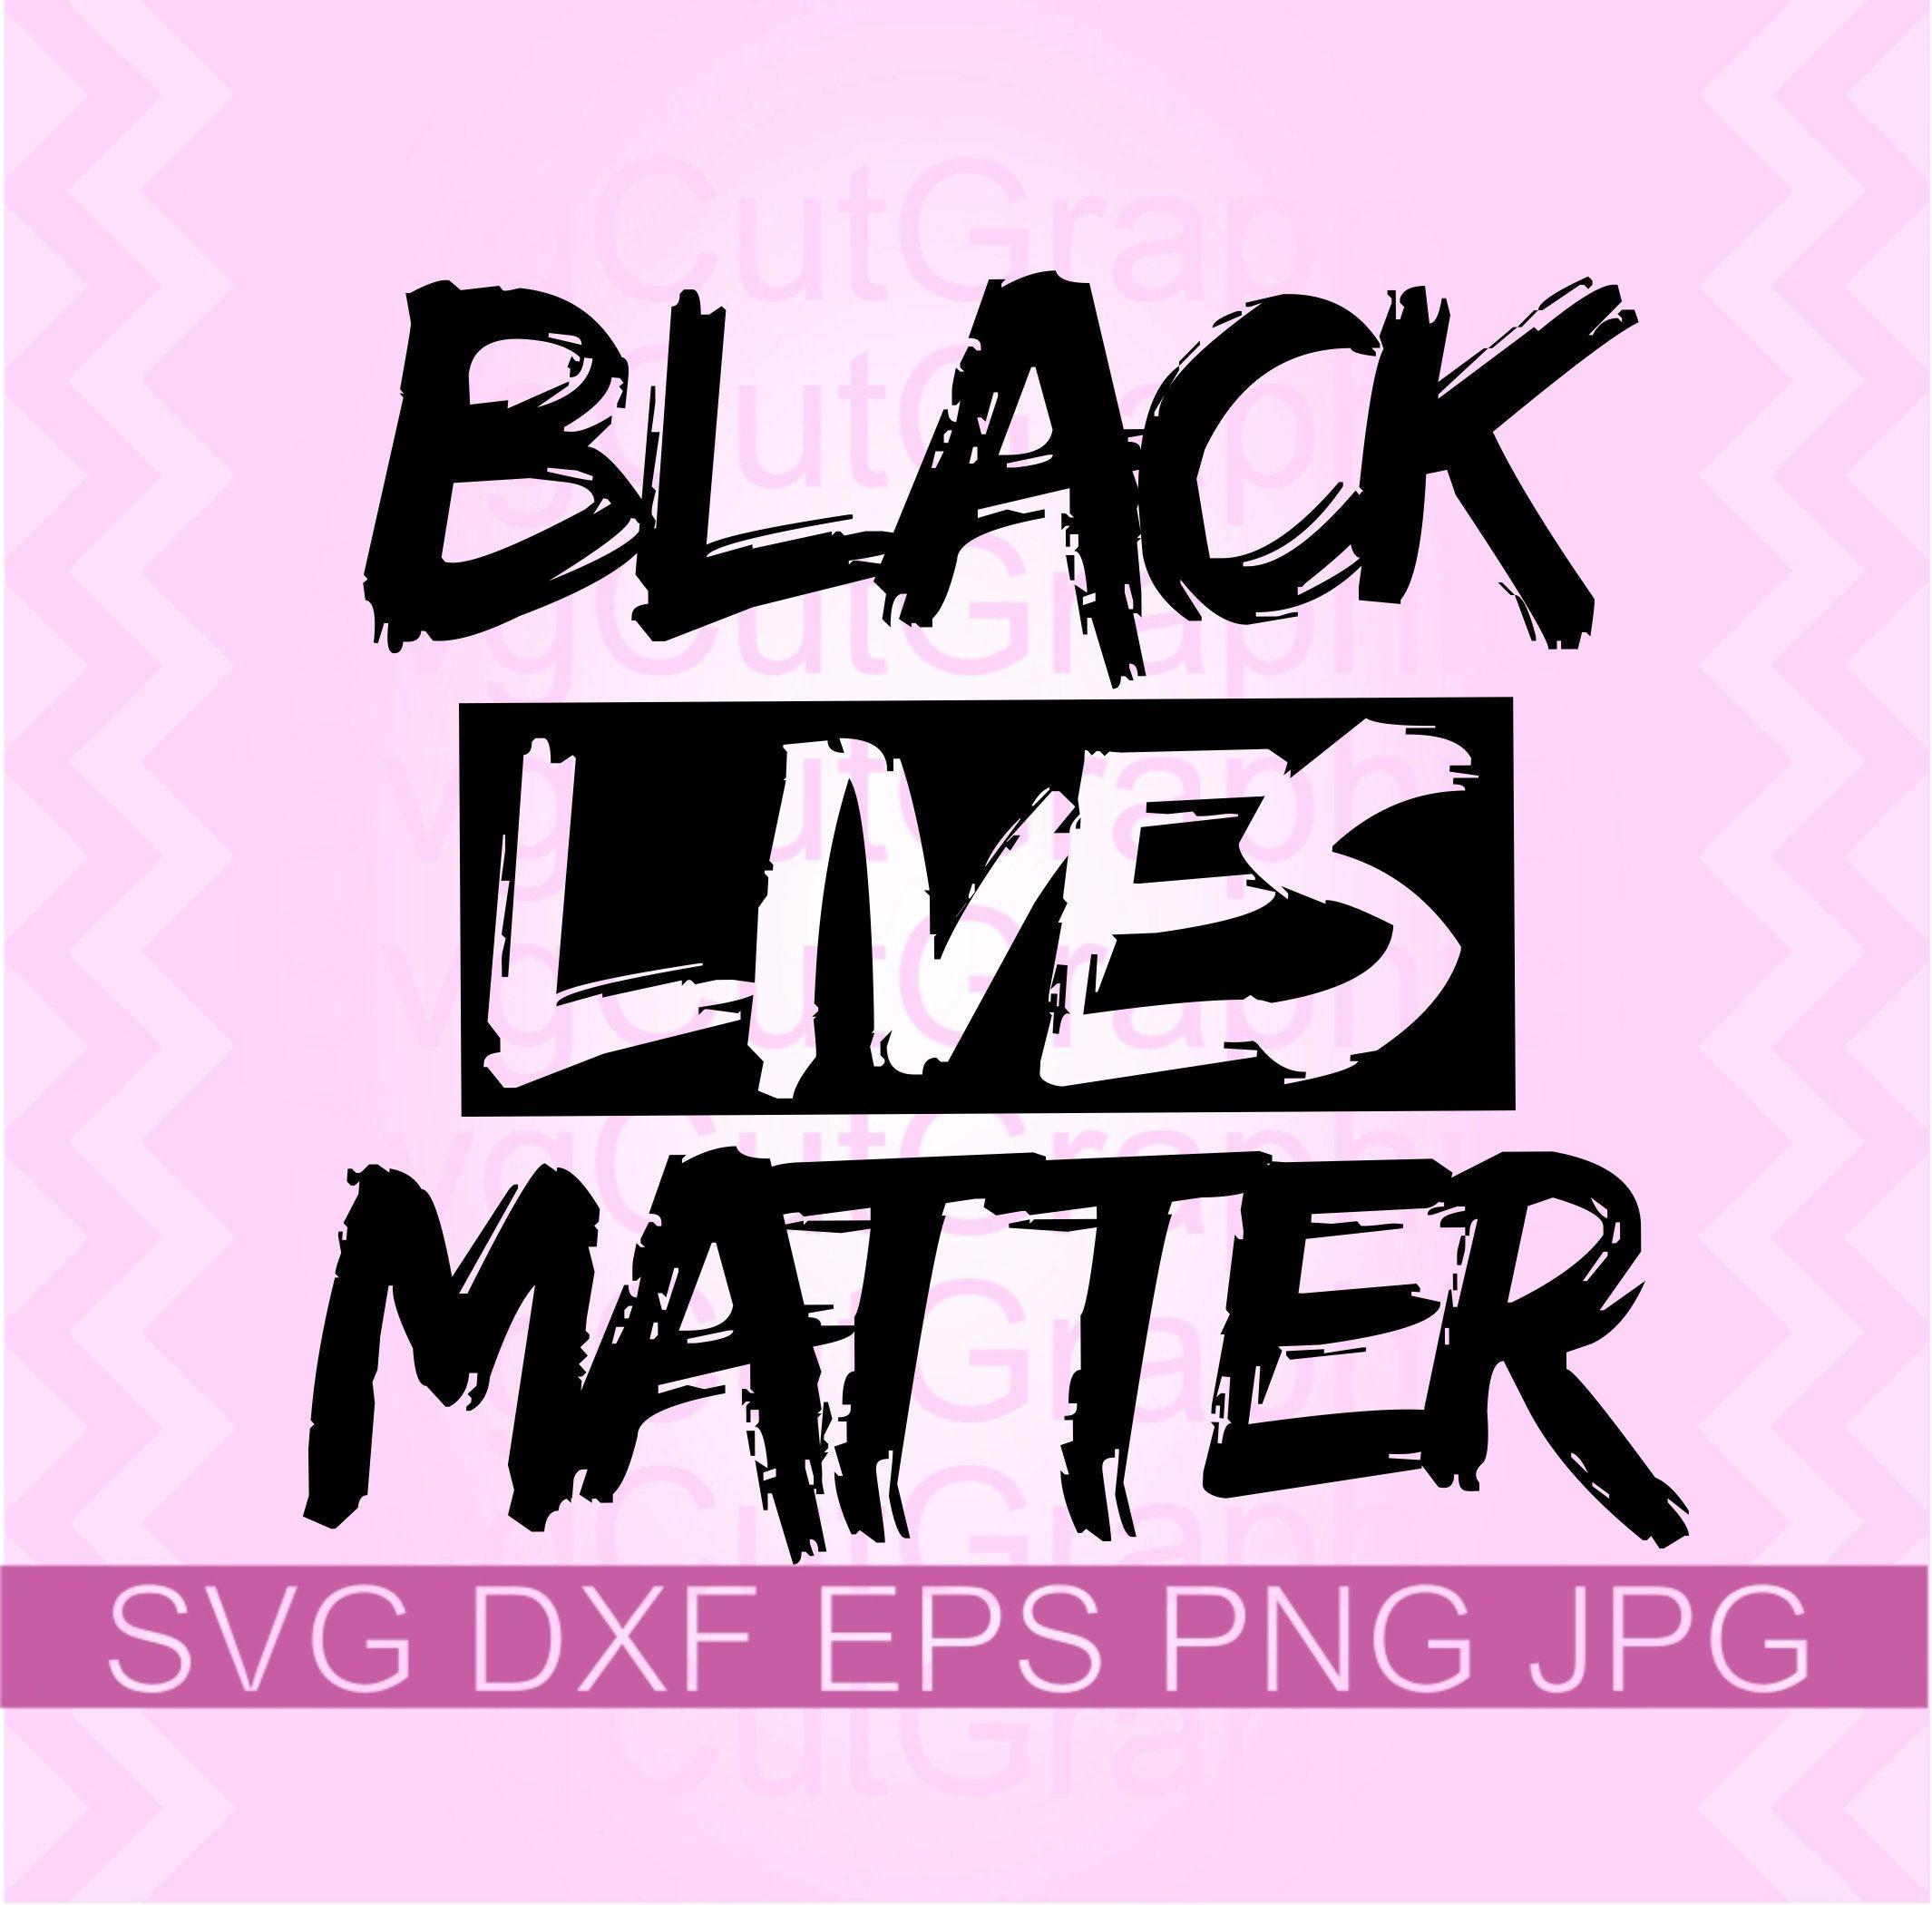 Black Lives Matter SVG File For Cricut & Silhouette DXF